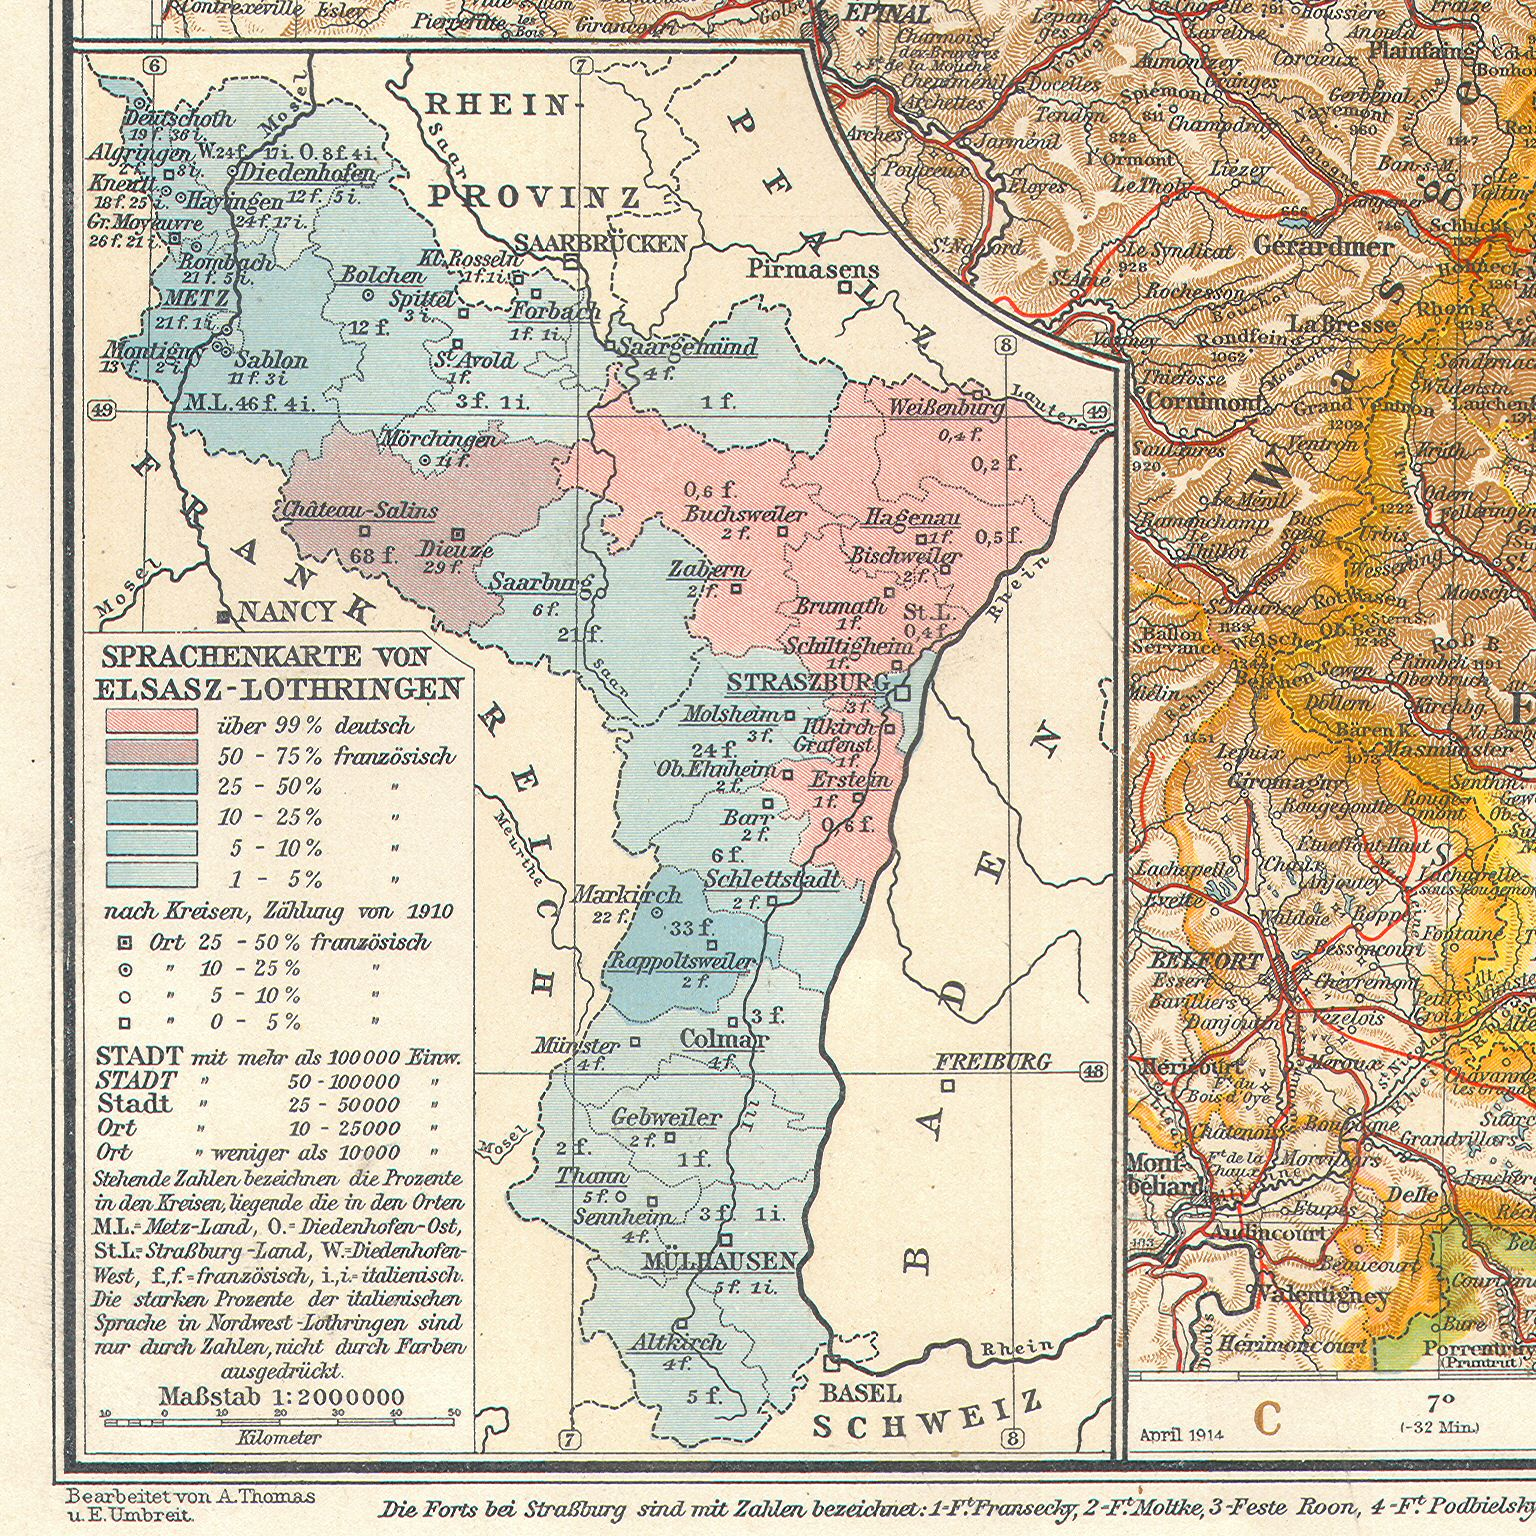 kroft family ancestry kroft croft peter 1811 1901